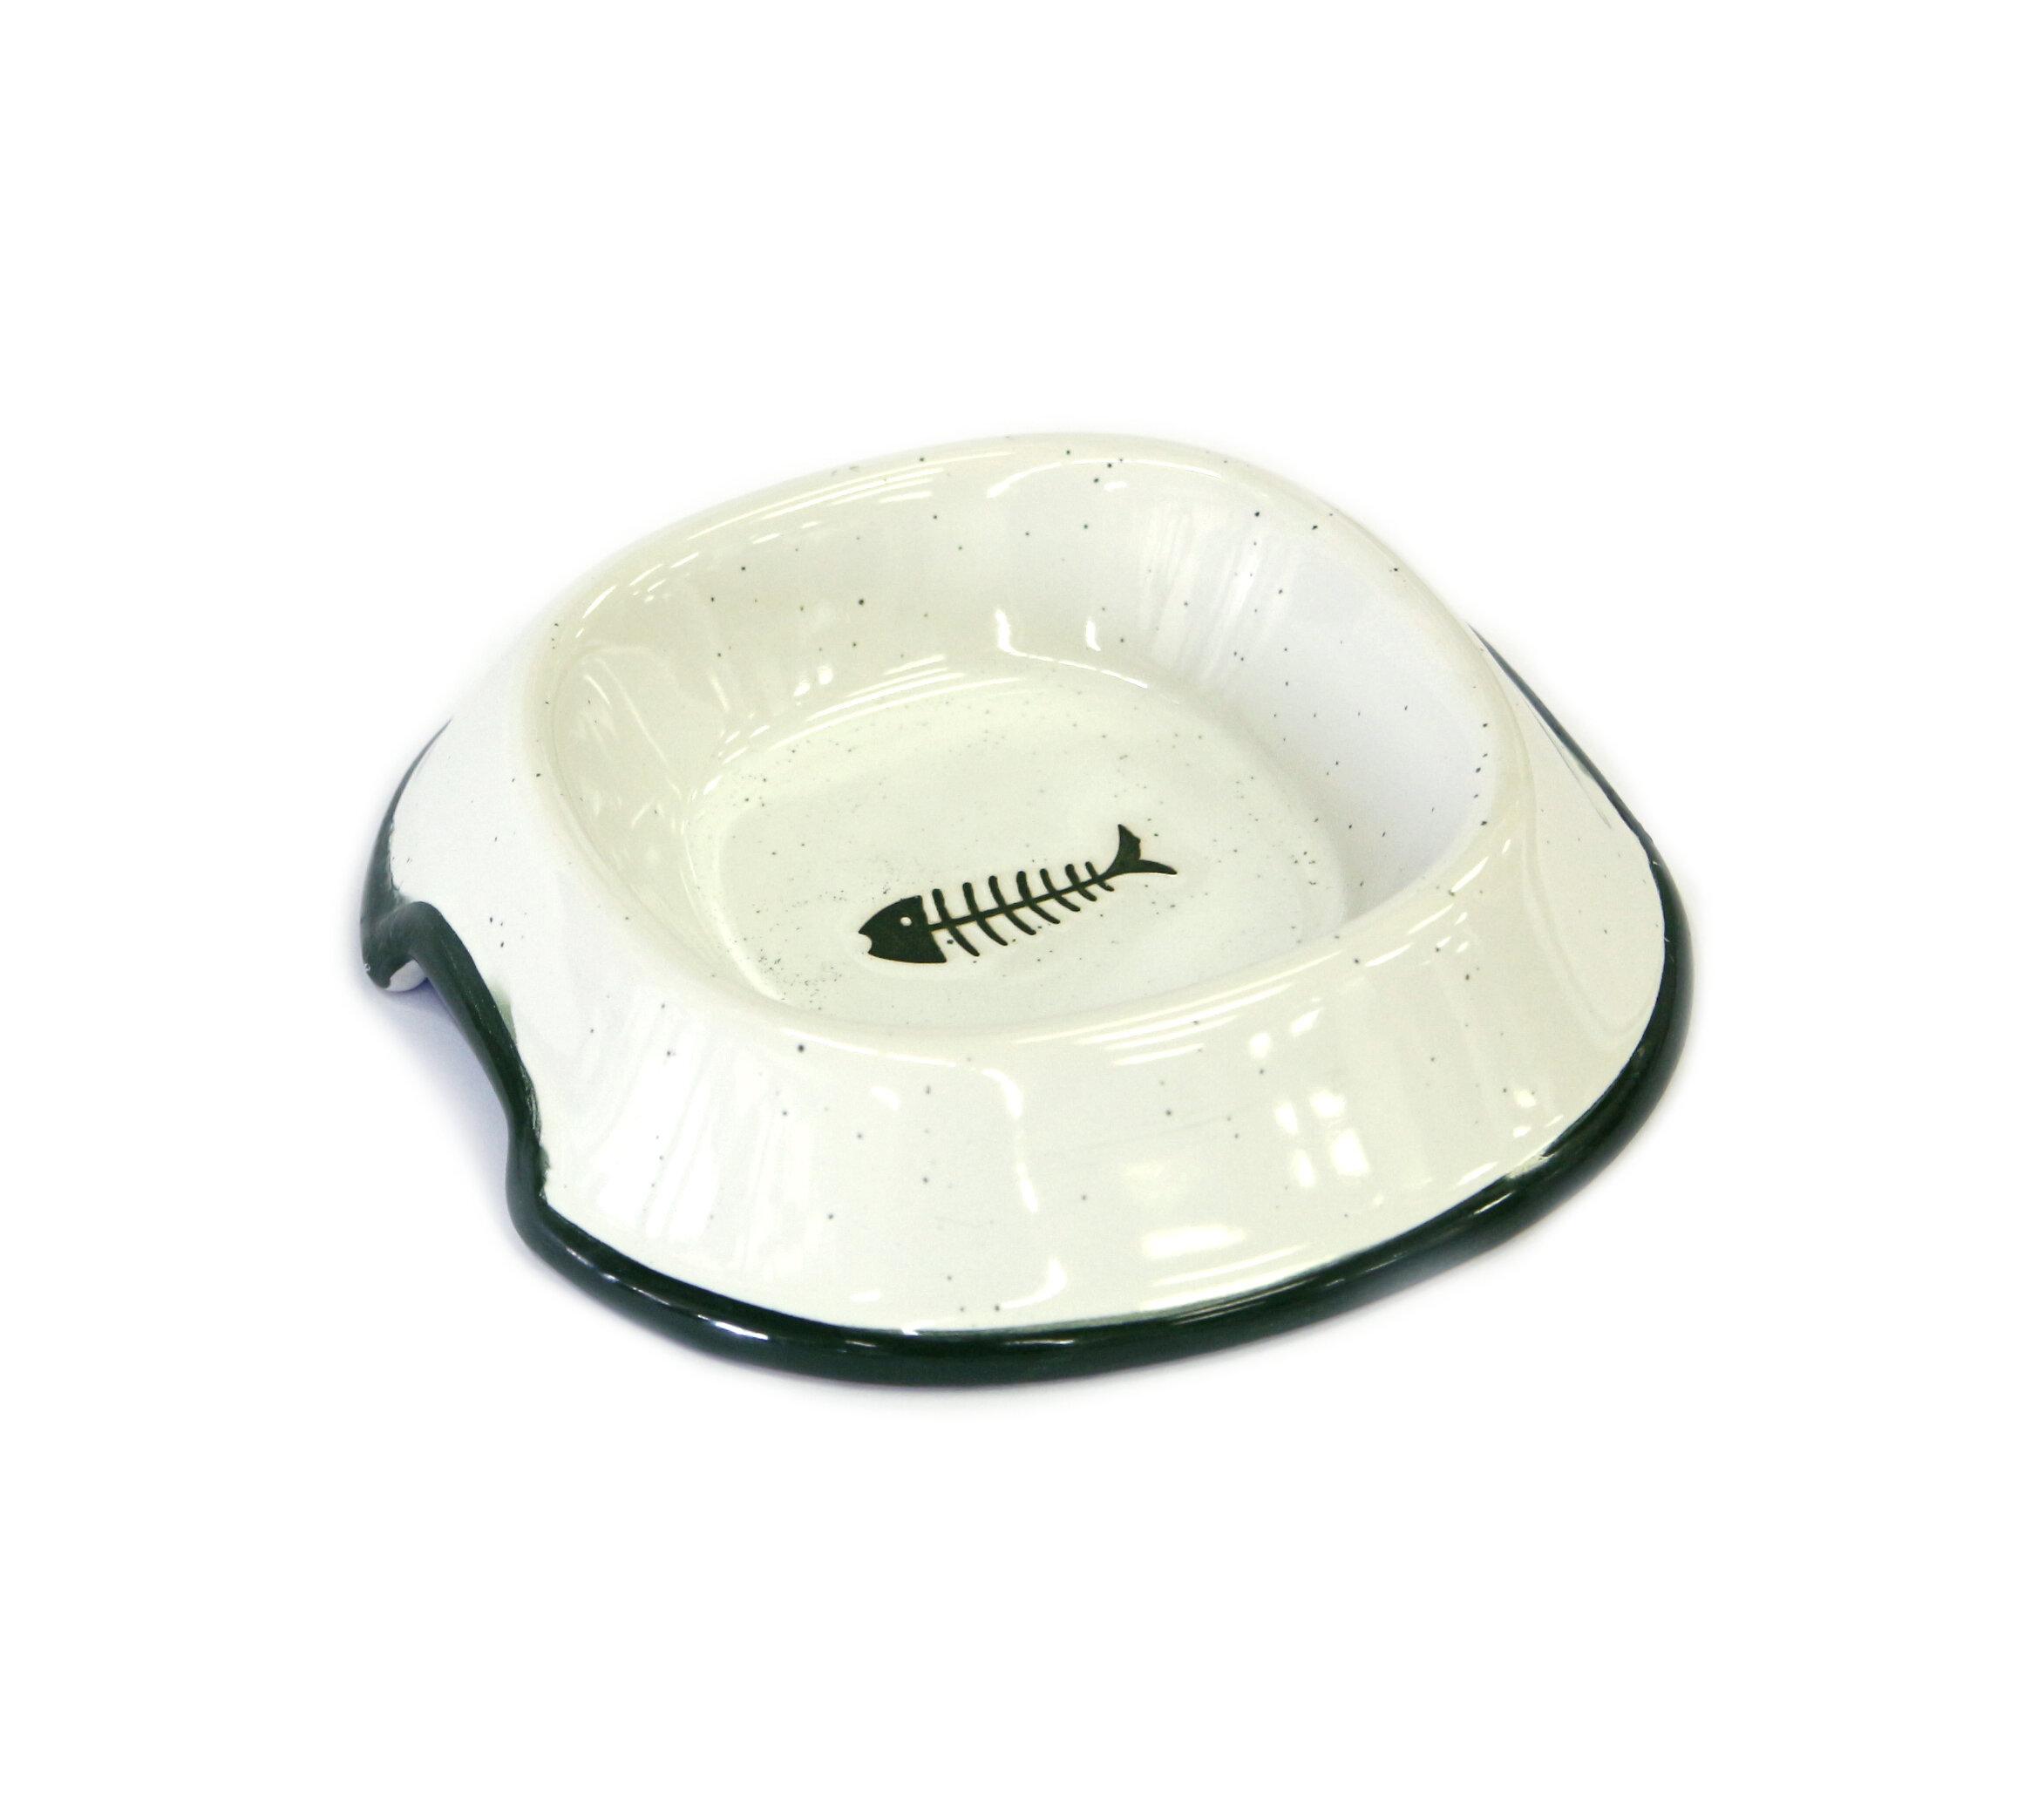 Ceramic Cat Amp Dog Bowls Dog Bowls Amp Fountains Bowls